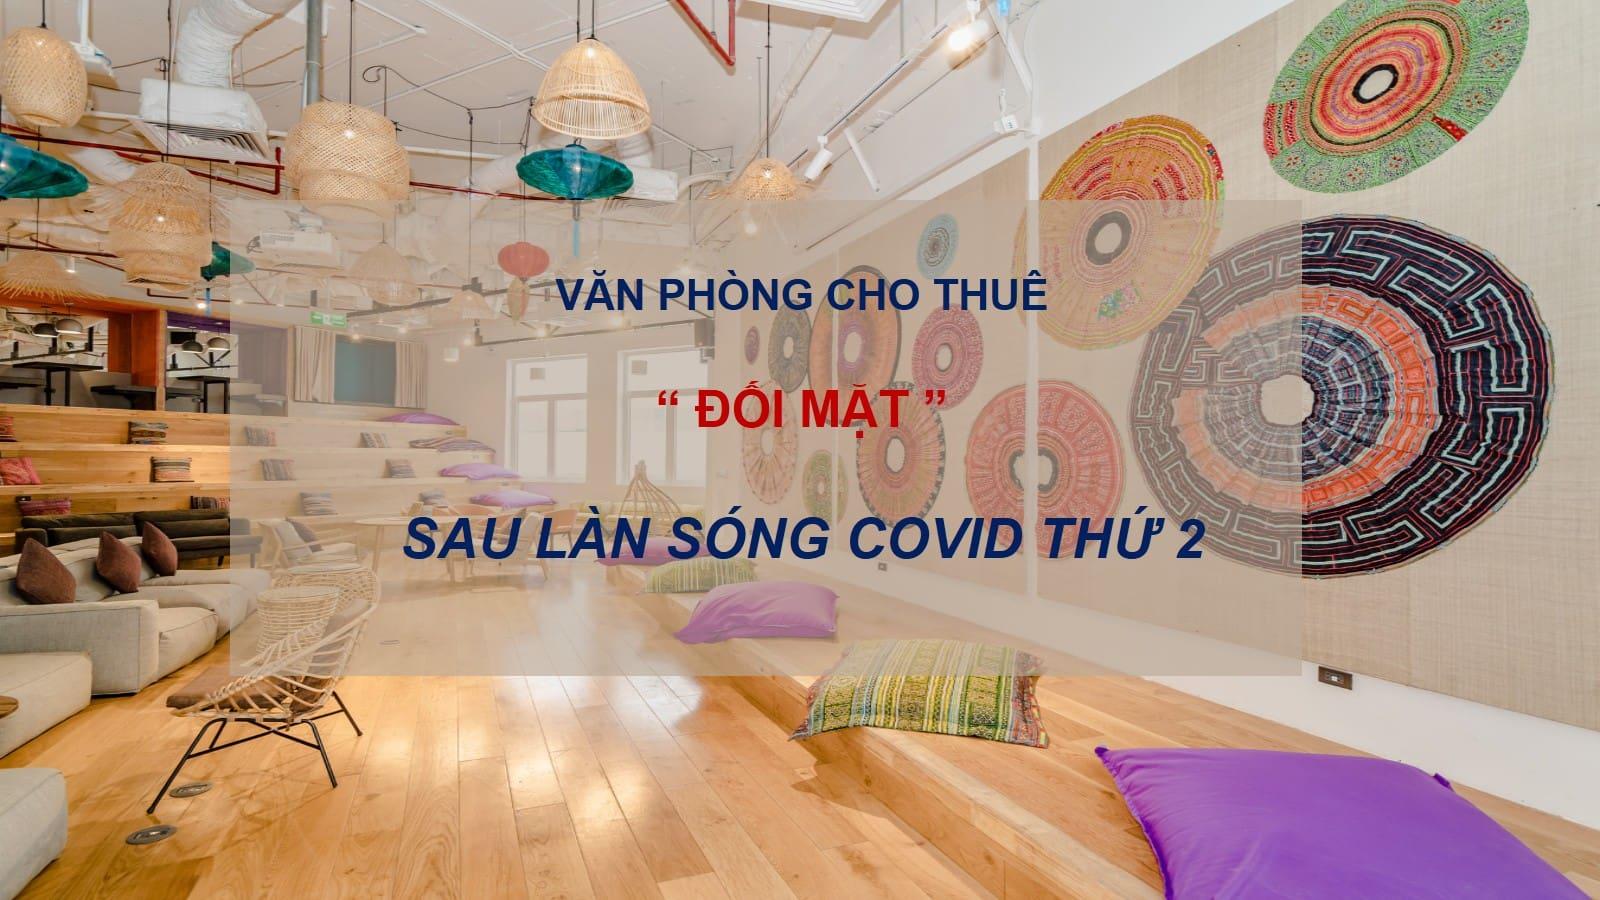 Van Phong Cho Thue Min